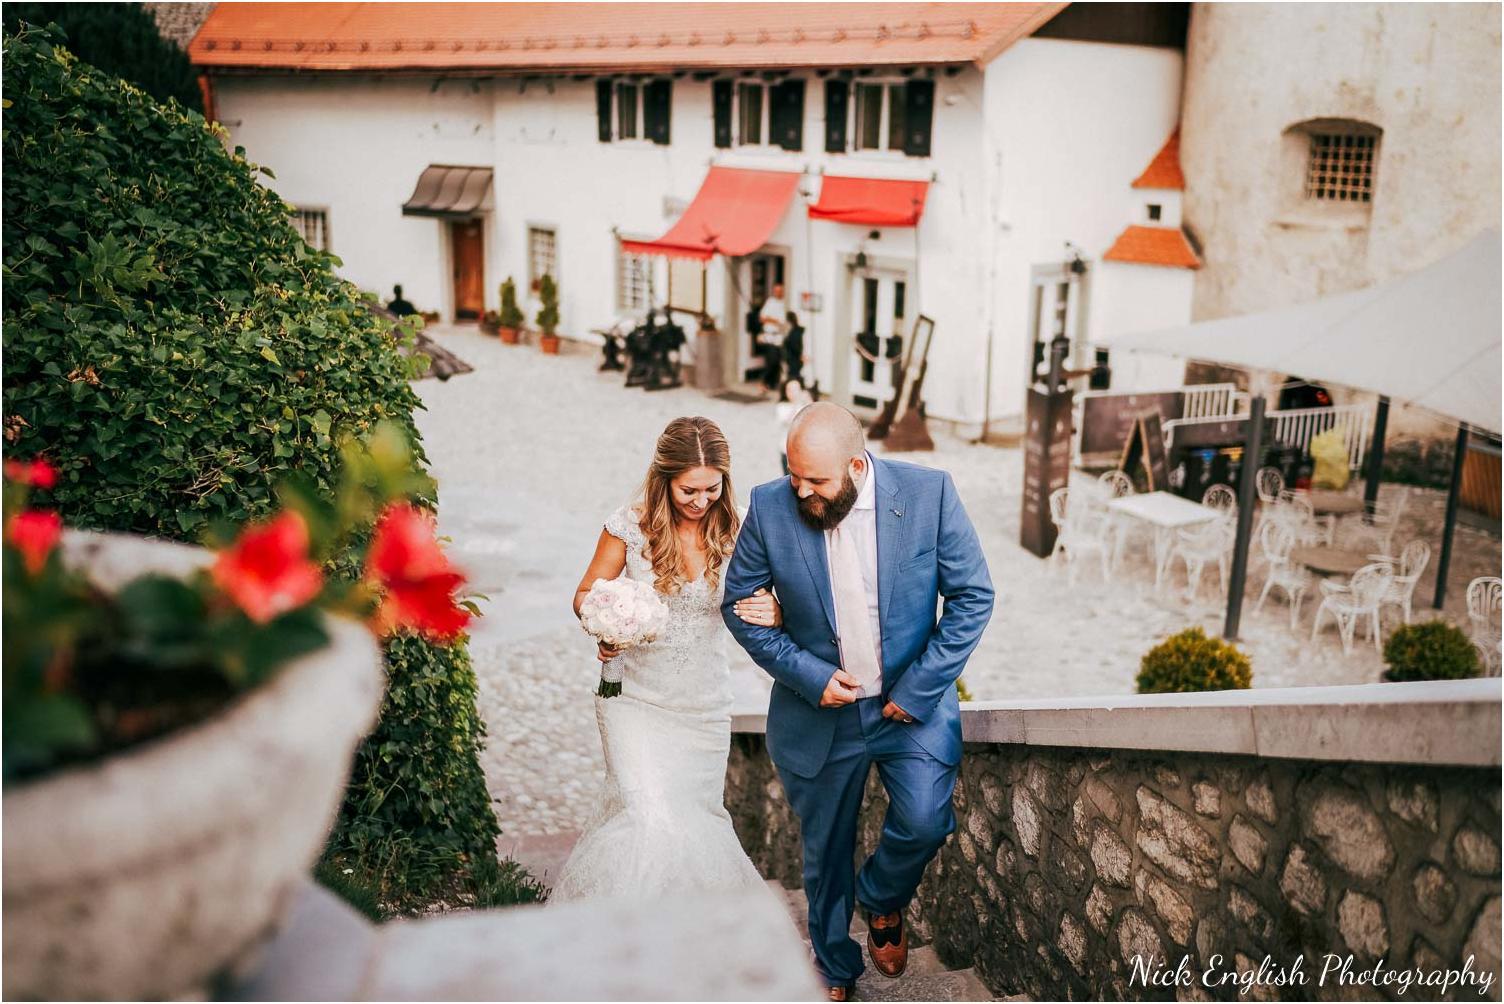 Destination_Wedding_Photographer_Slovenia_Nick_English_Photography-70-25.jpg